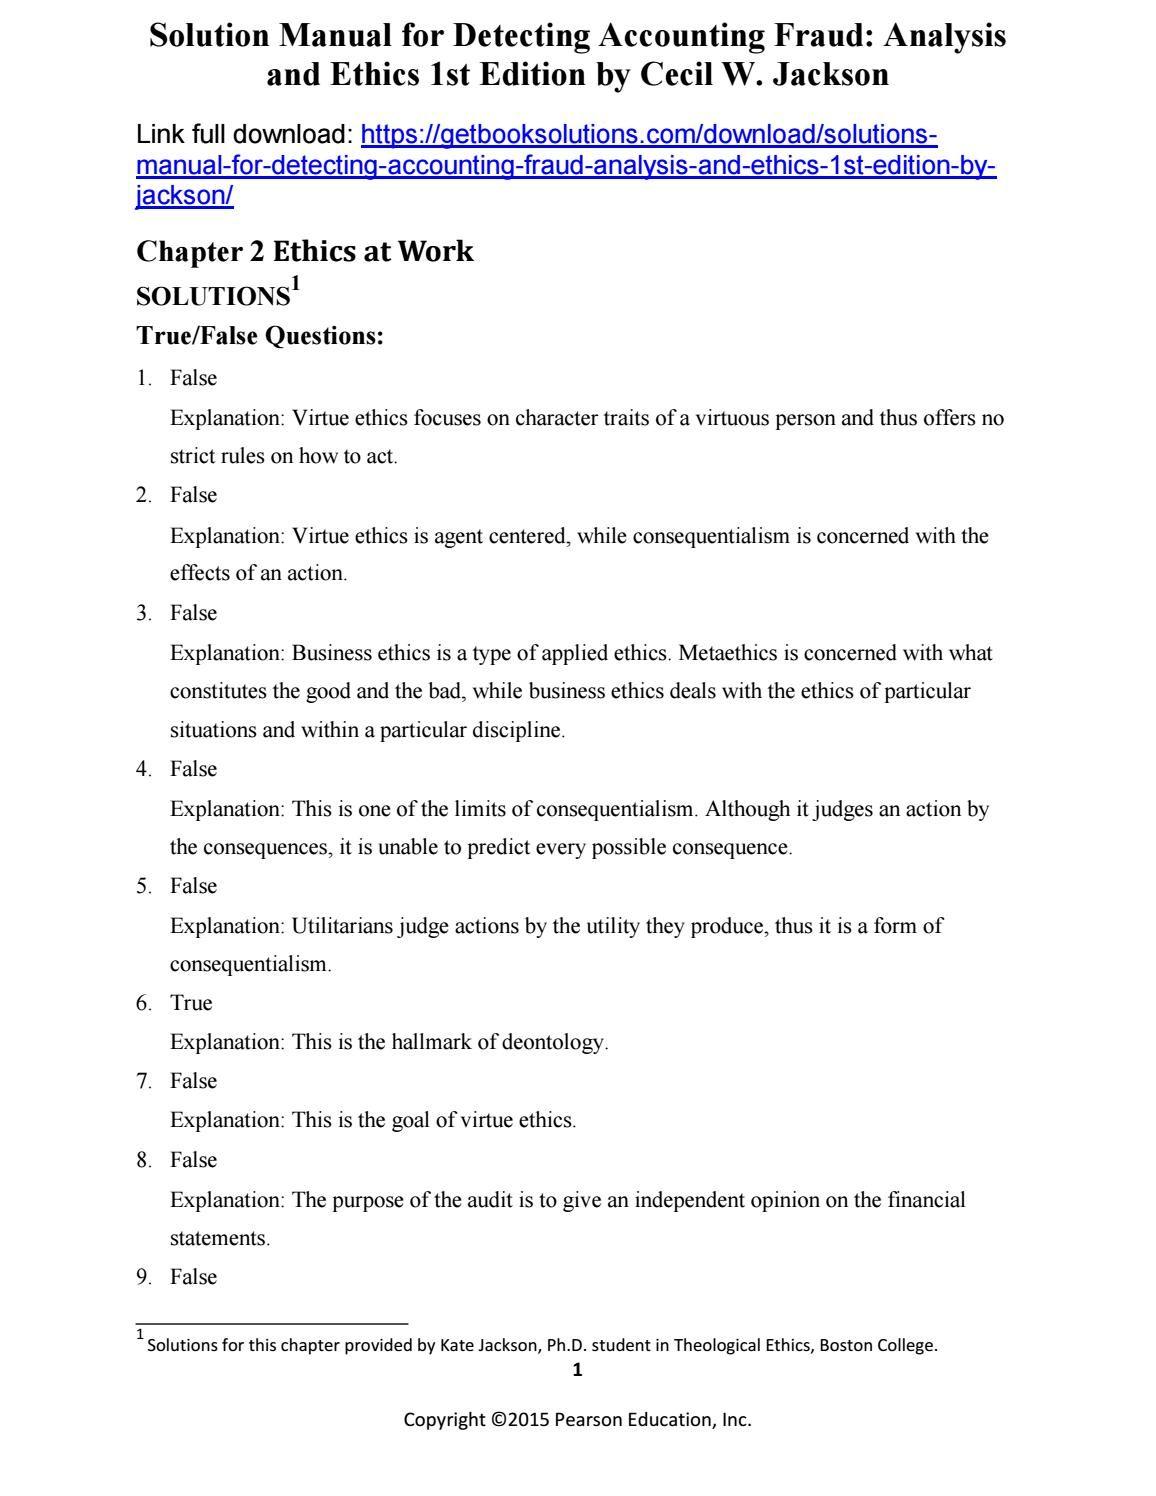 Solutions manual detecting accounting fraud analysis ethics 1st edition  jackson